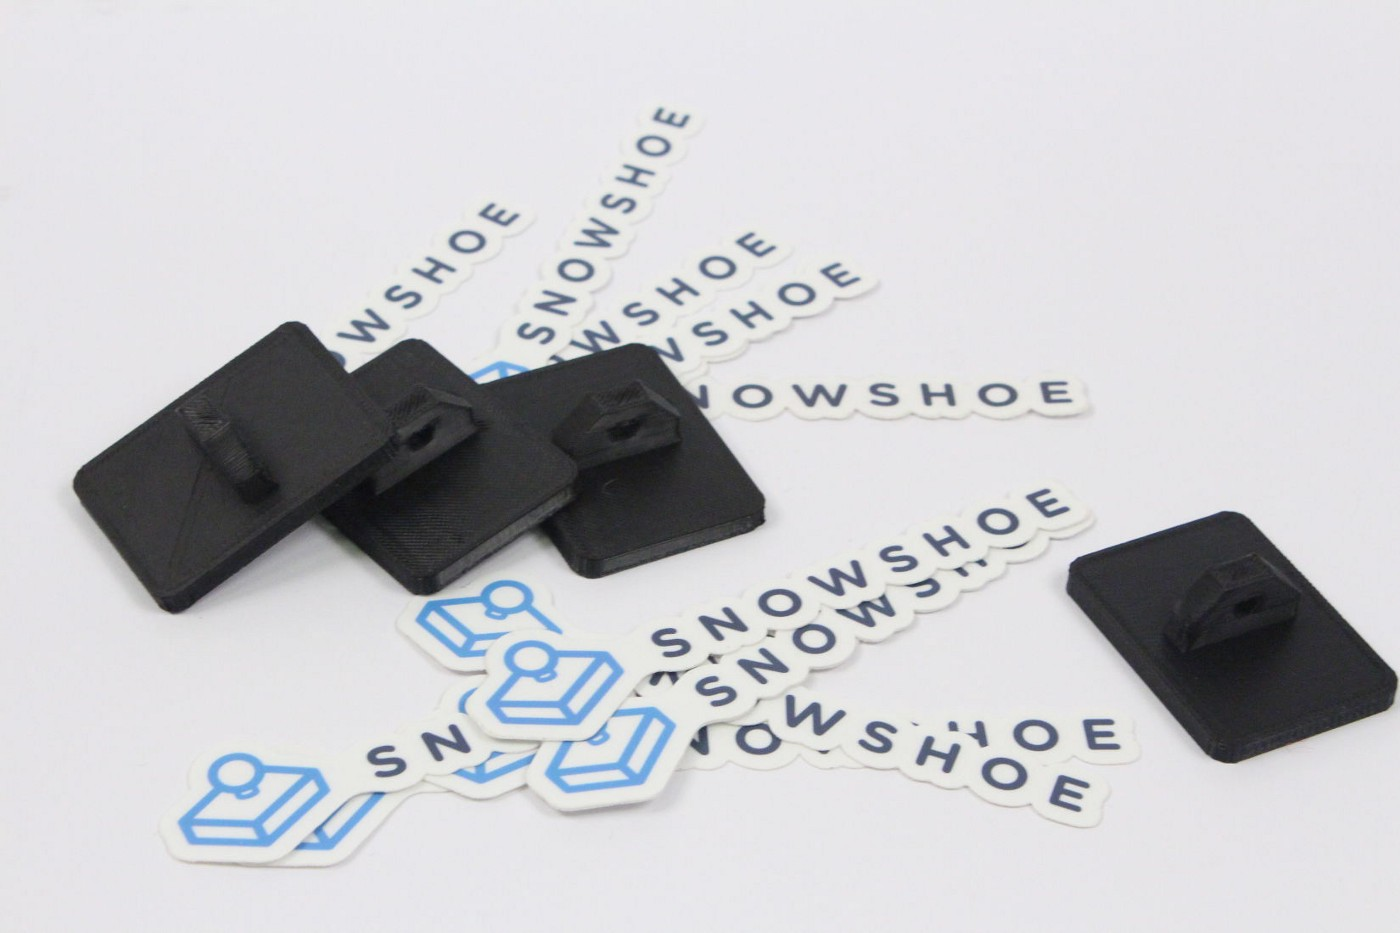 Snowshoe hardware stamps